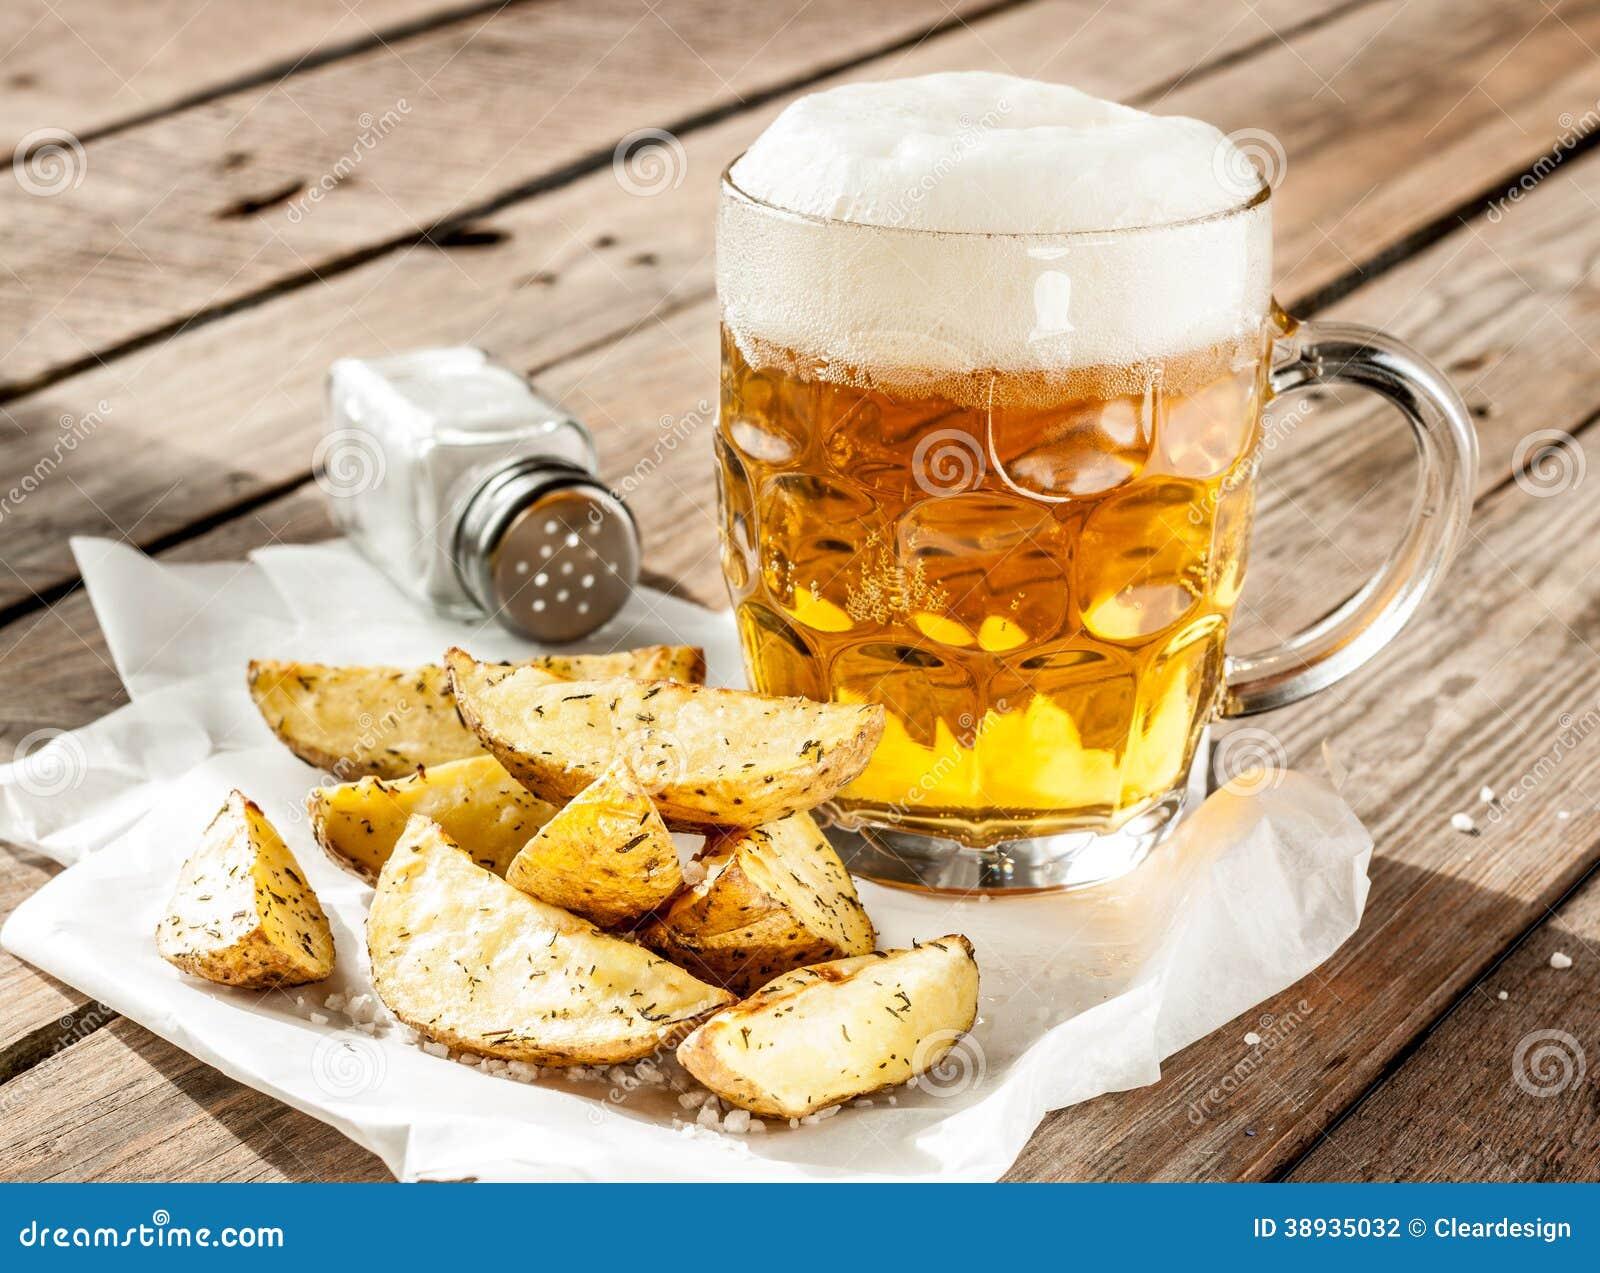 beer mug and potato wedges on wood table stock photo. Black Bedroom Furniture Sets. Home Design Ideas